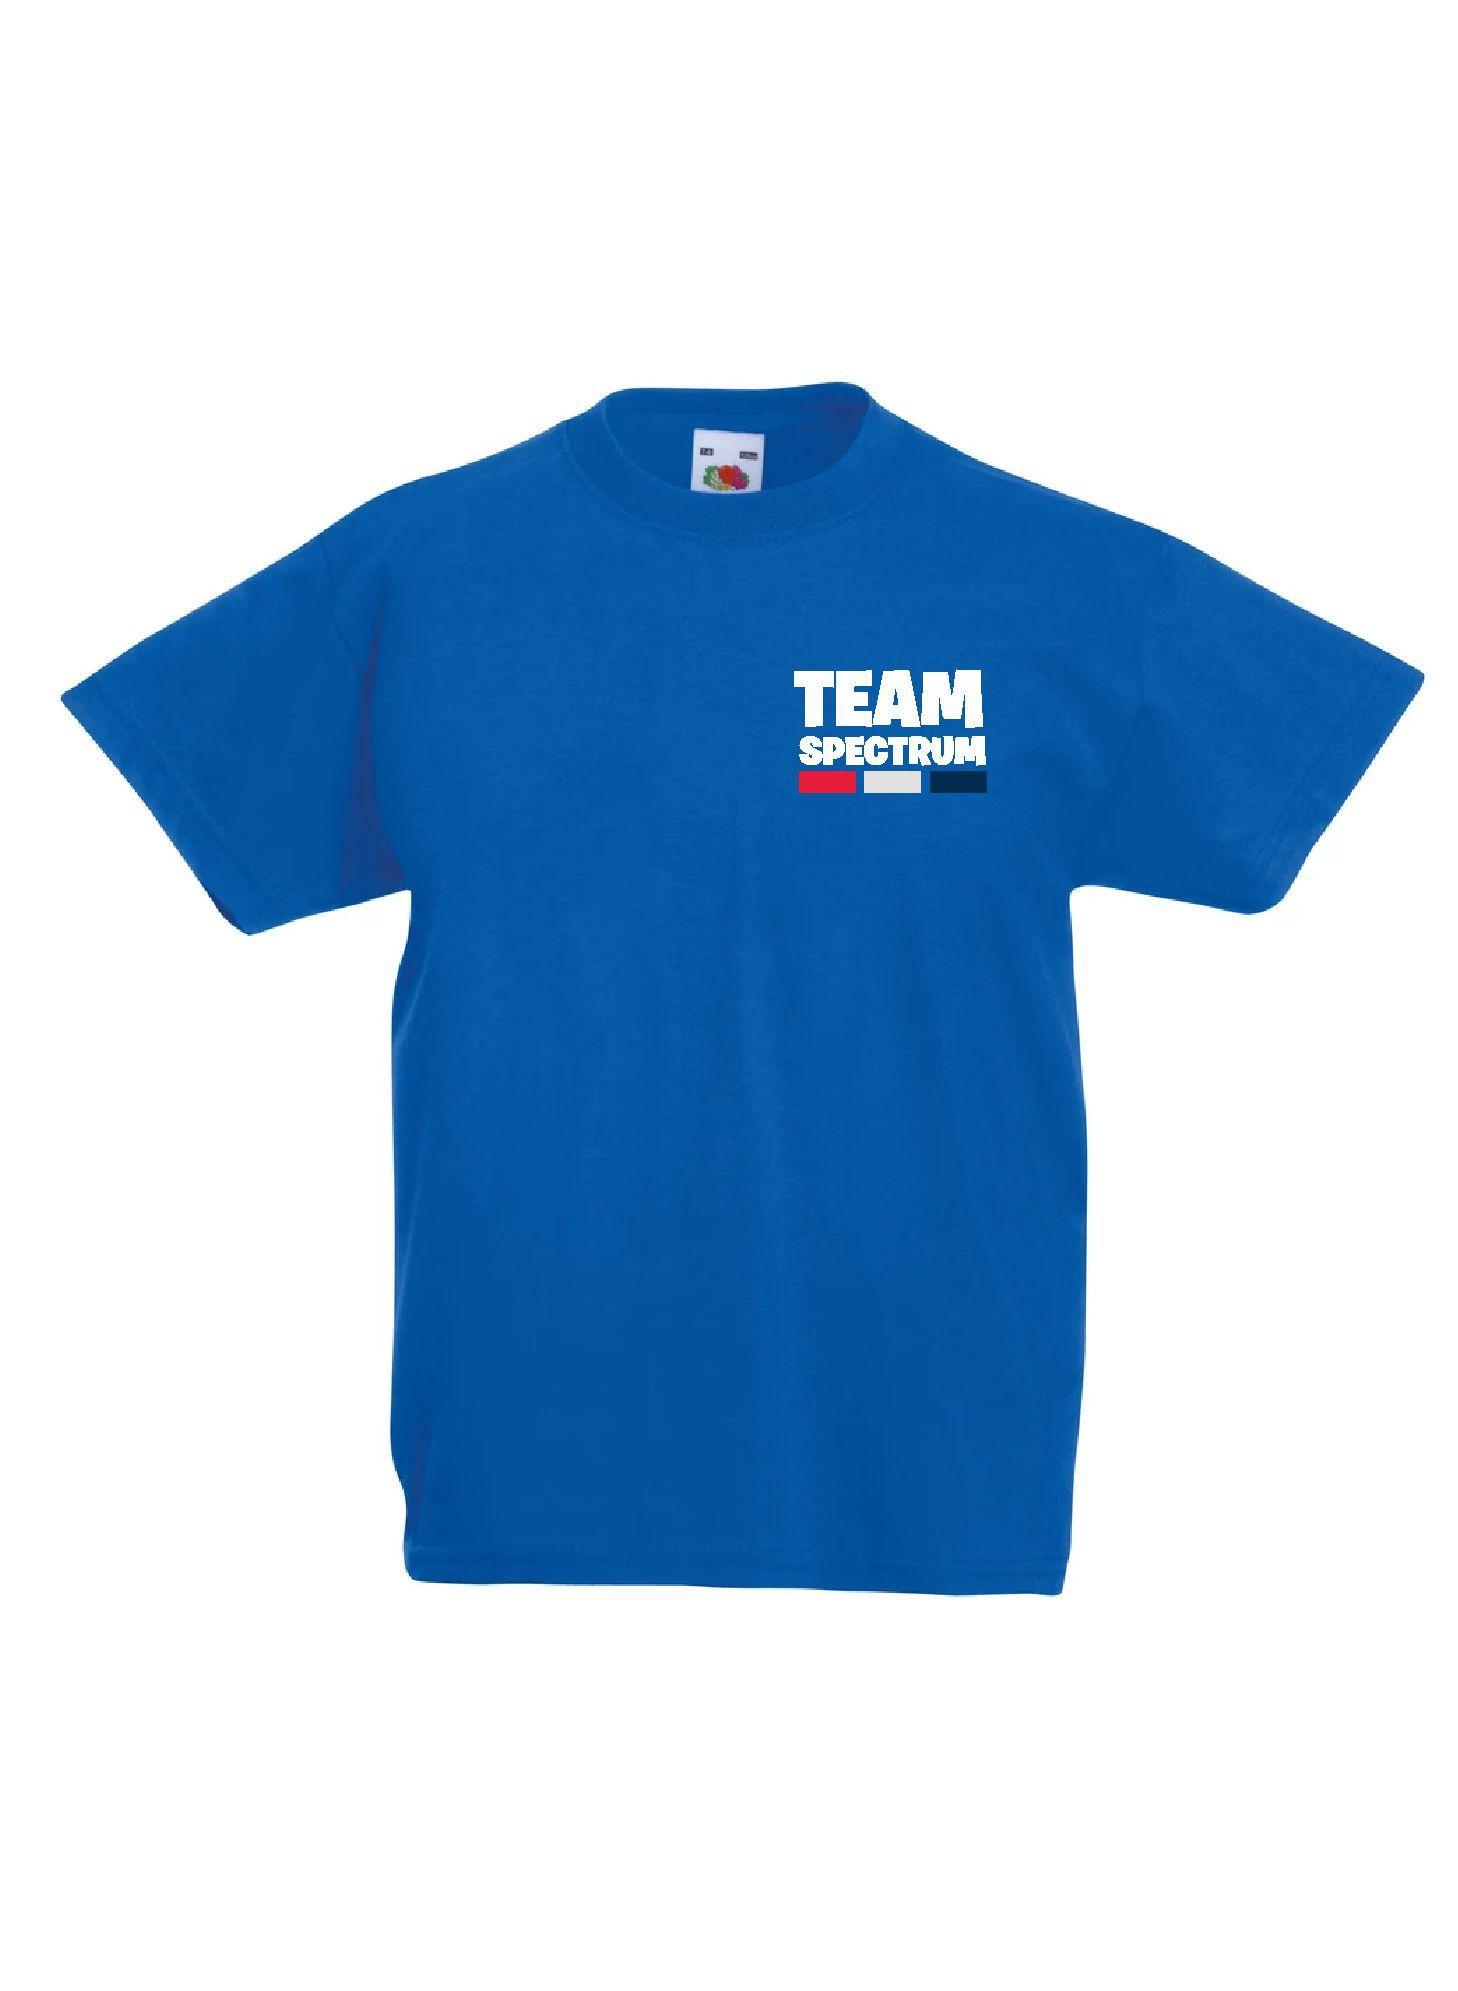 Team Spectrum - Tee (Kids)